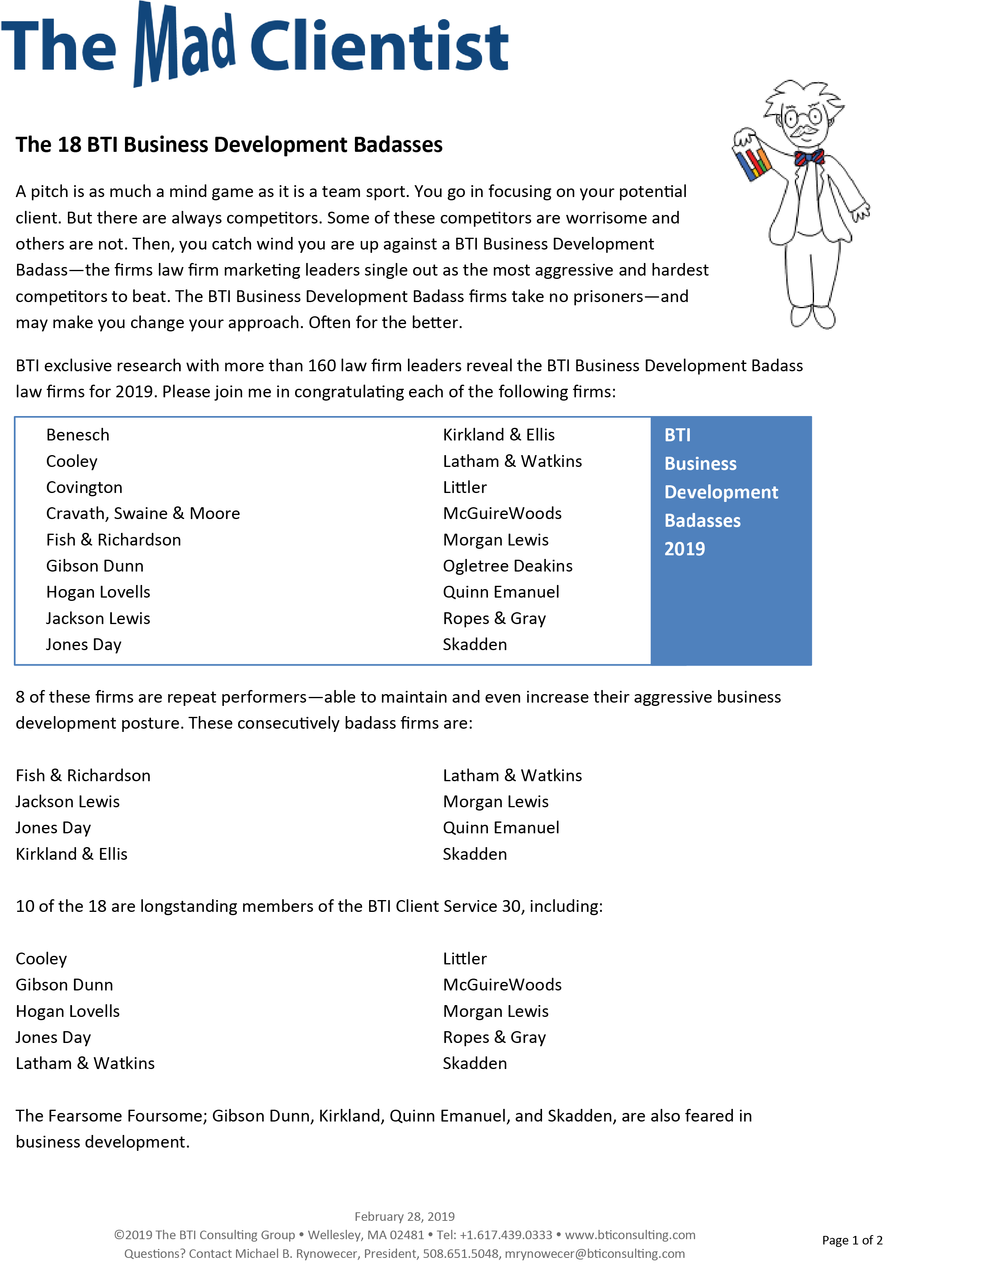 BTI Business Development Badasses Final_image.png